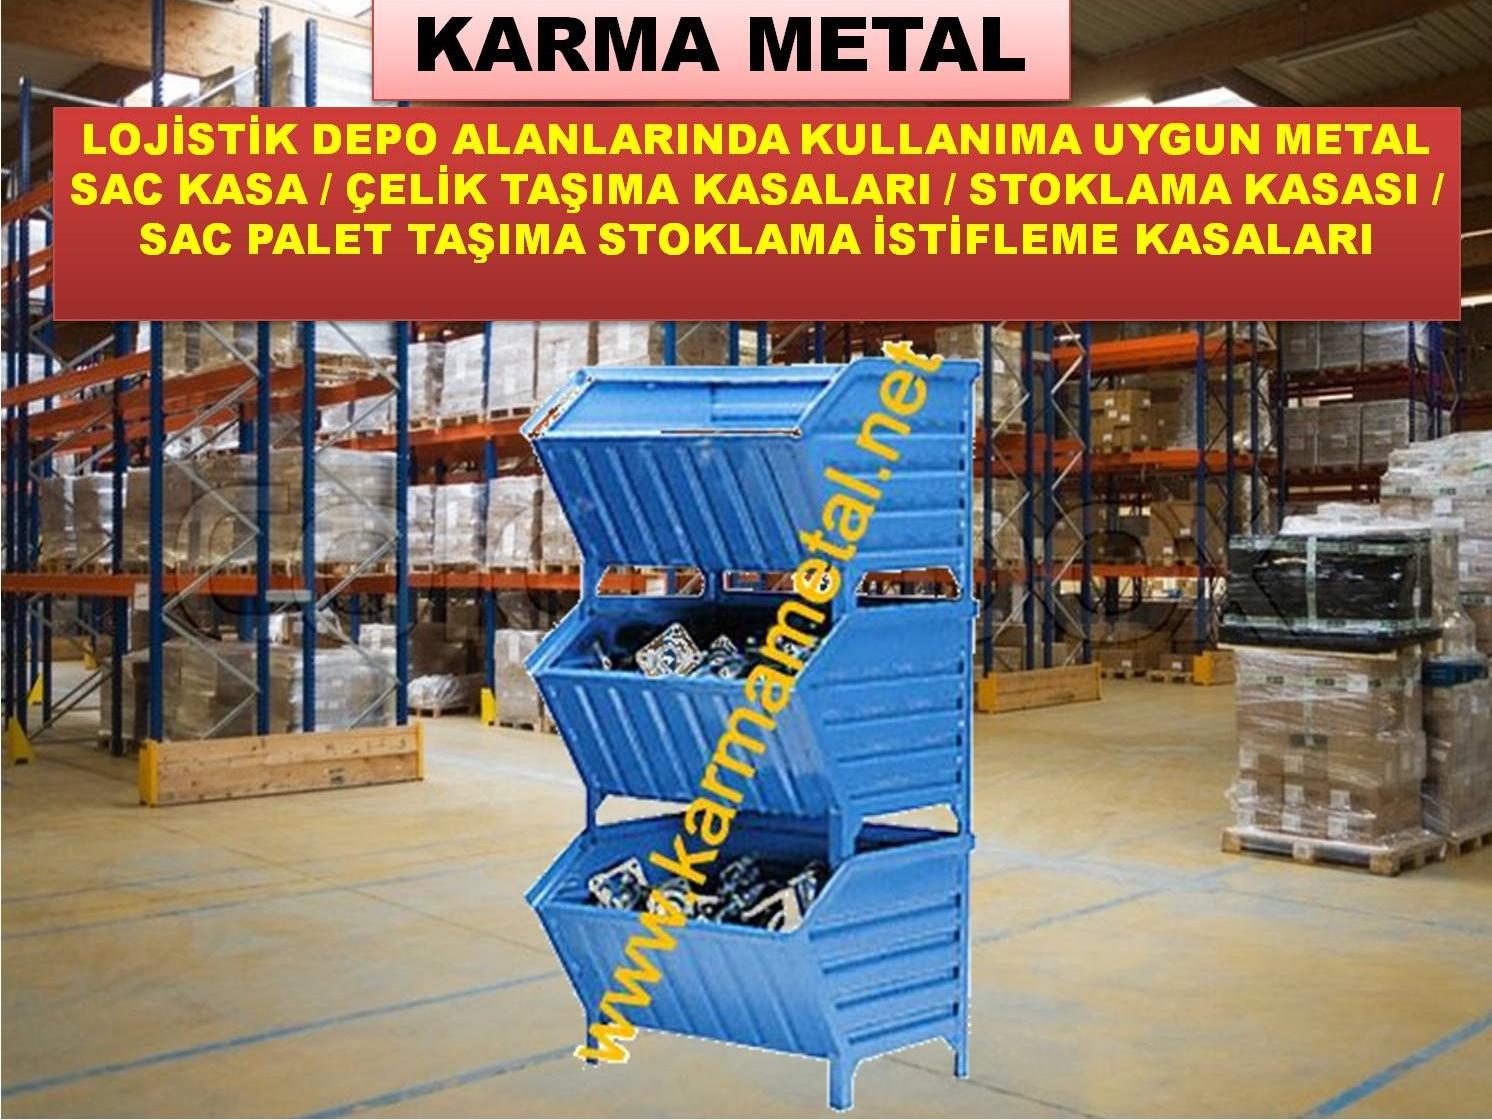 katlanabilir_katlanir__kasa__metal_celik_sac_tasima_stoklama_istifleme__kasasi_kasalari_sandiklari (7)